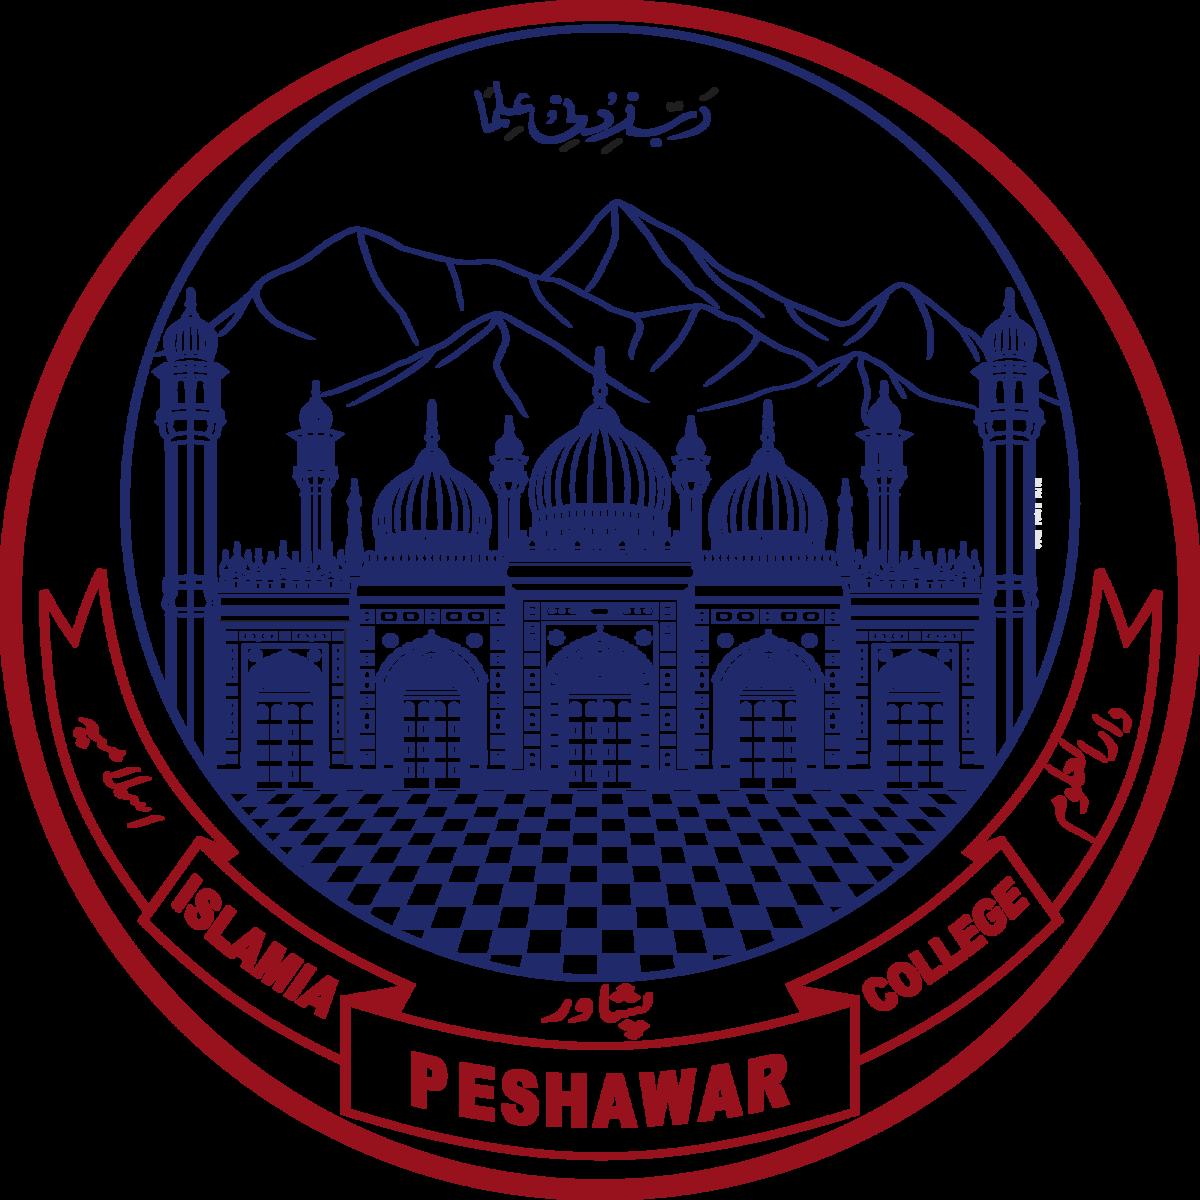 Islamia college university wikipedia. Mosque clipart islamiat